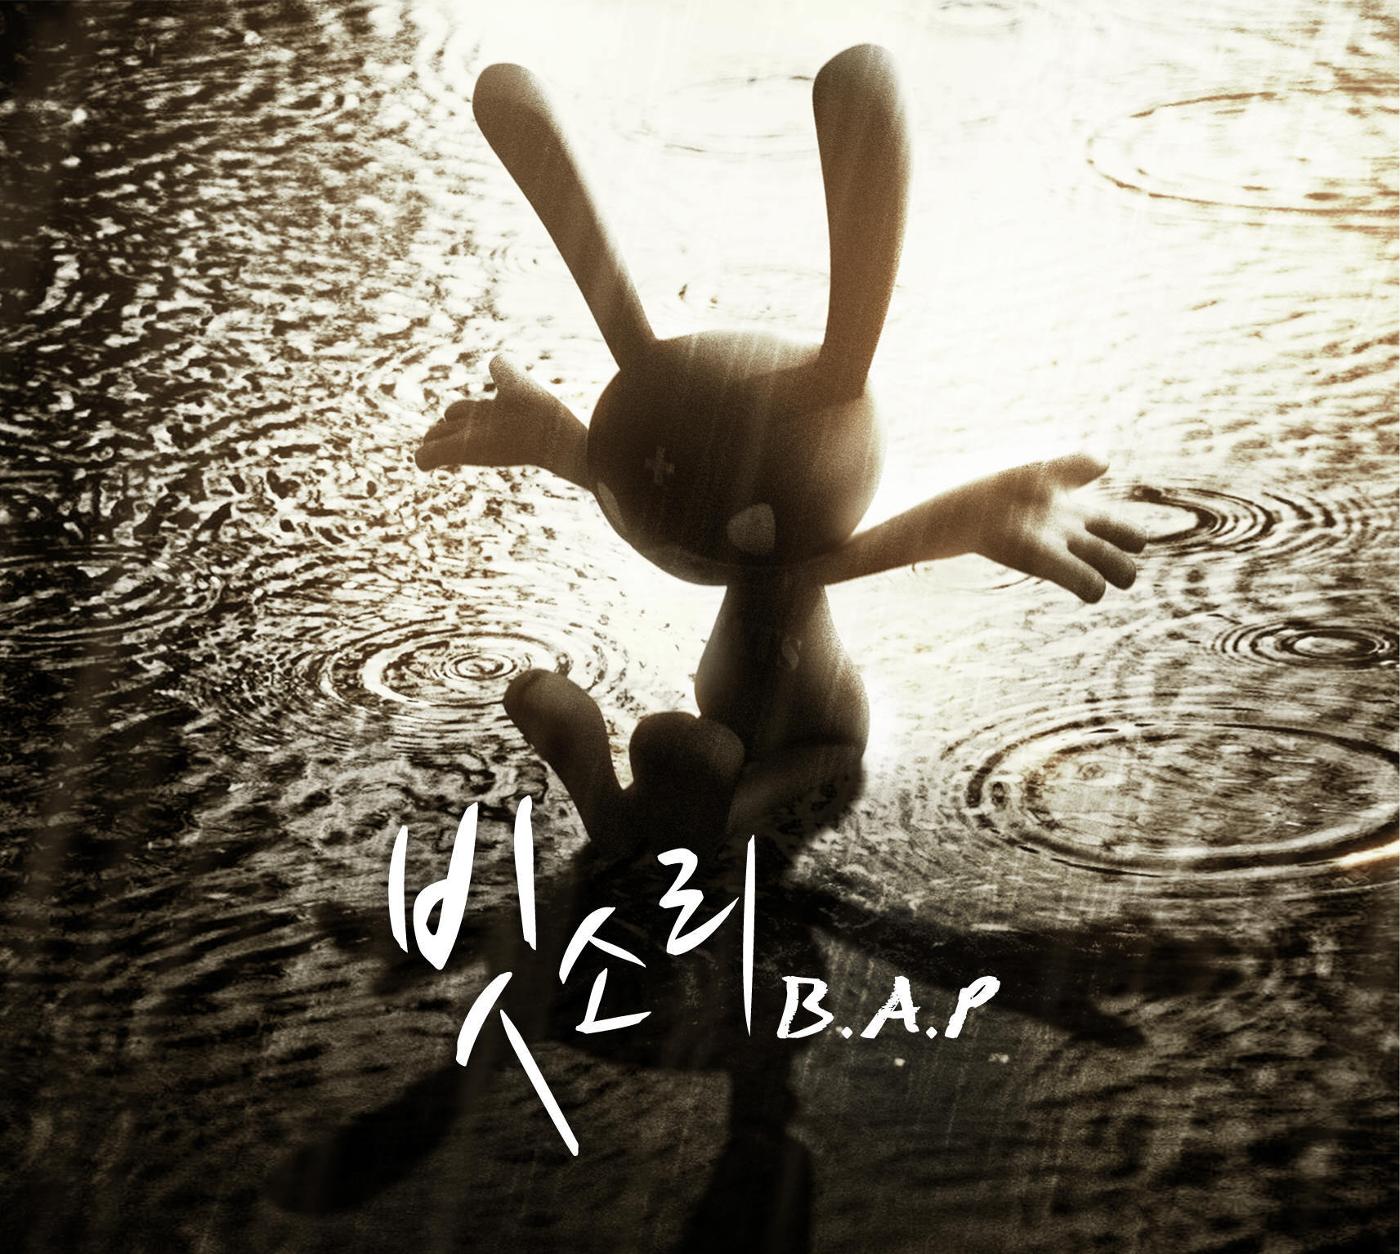 Download mp3 b. A. P rain sound. Mp3 free on ilkpop. Com.